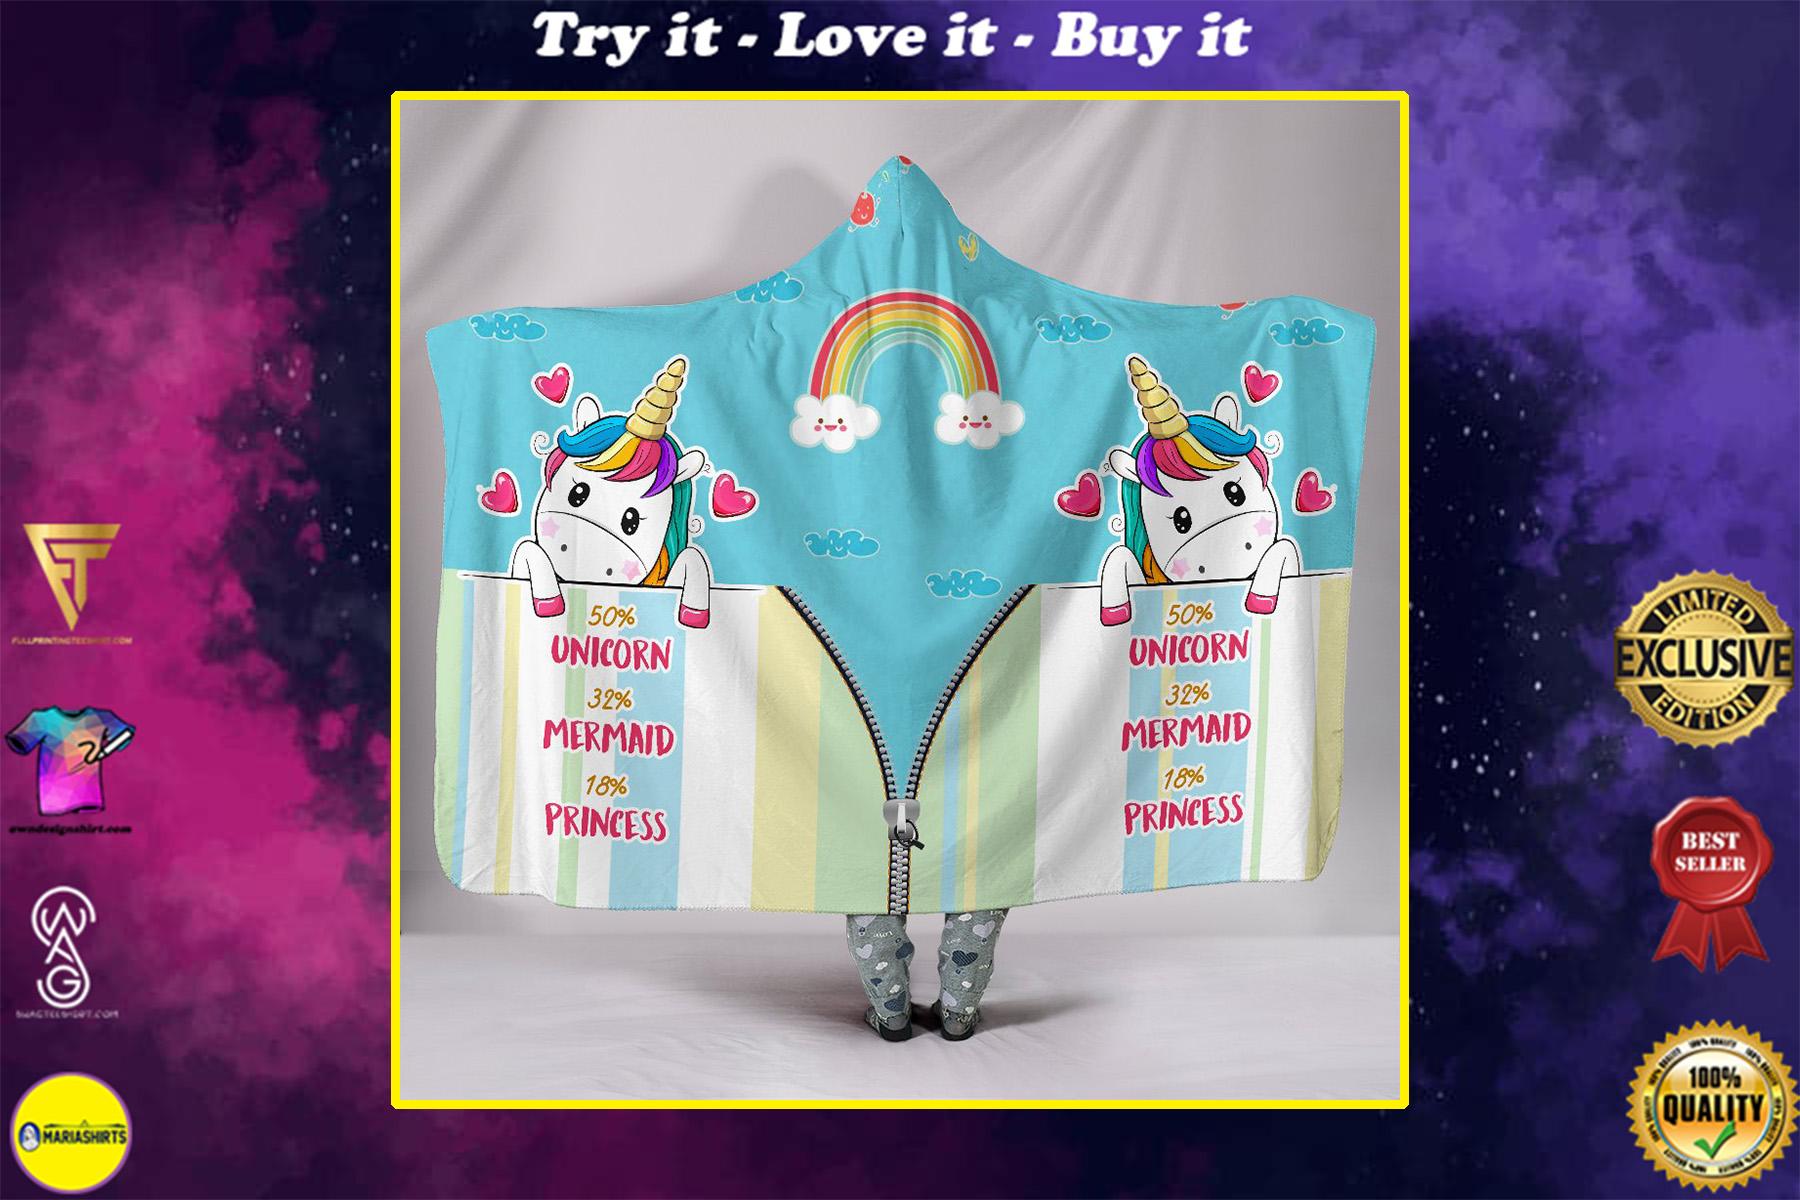 unicorn mermaid princess full printing hooded blanket